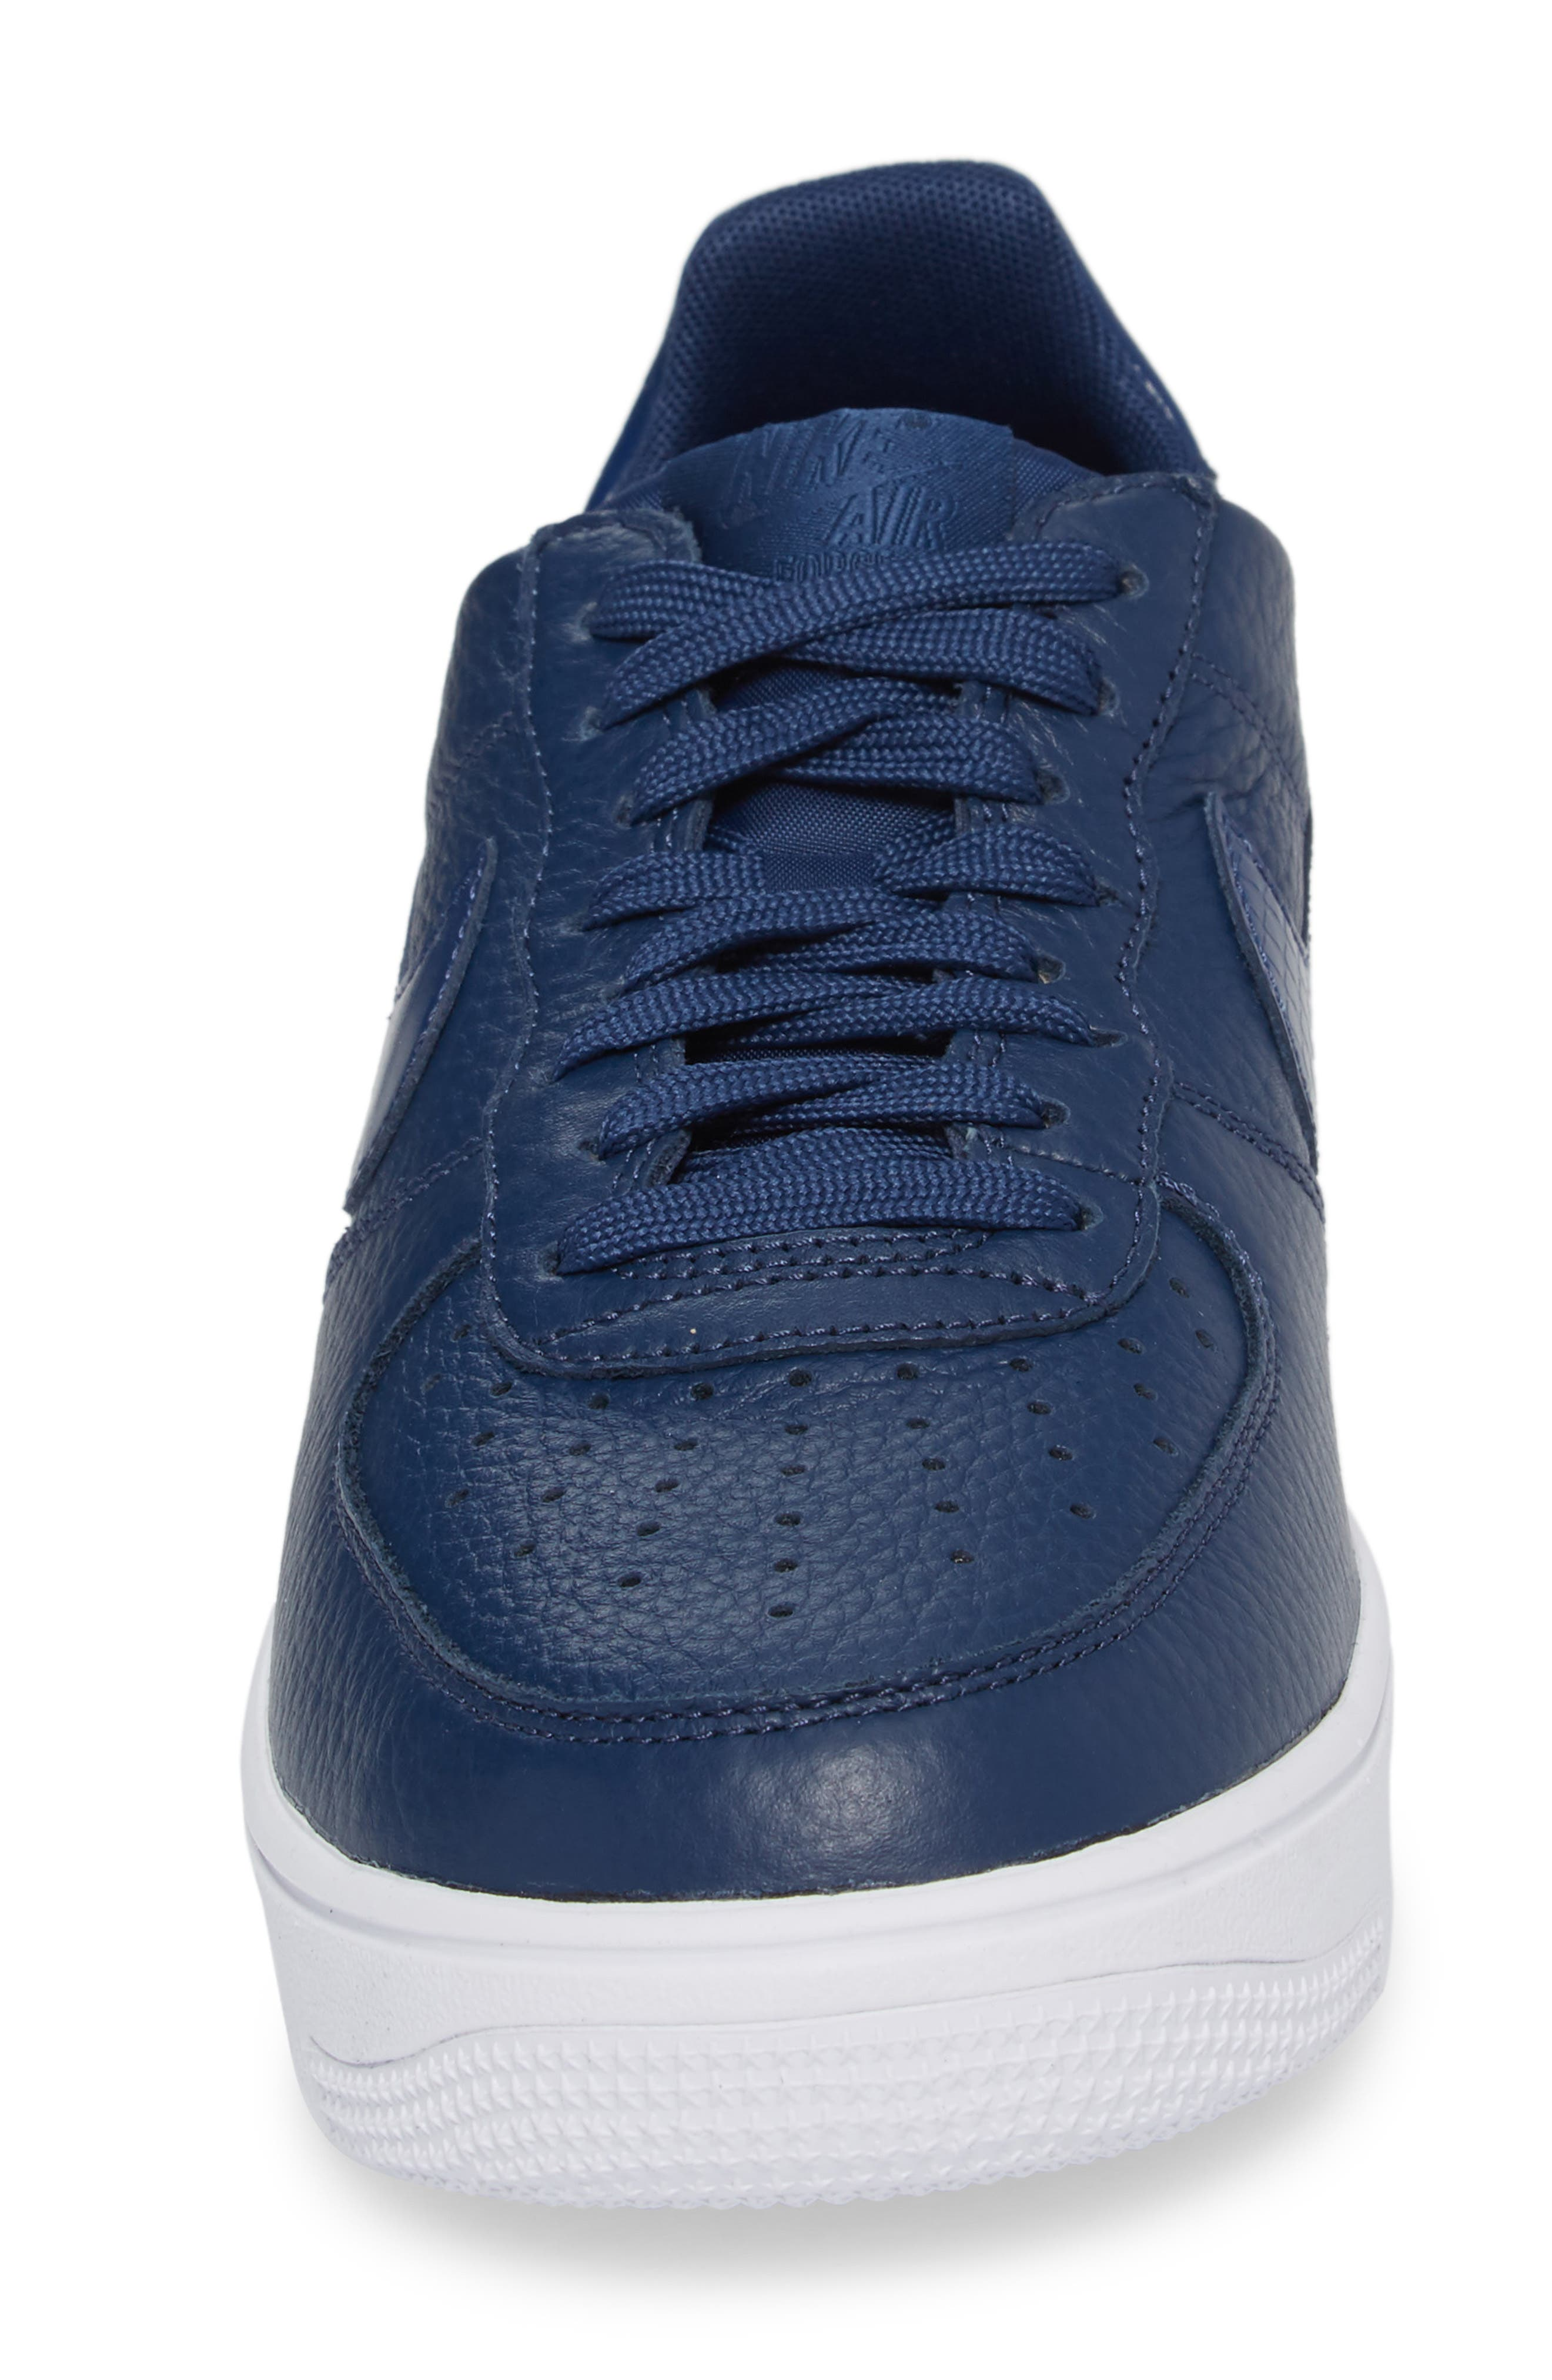 Air Force 1 Ultraforce Sneaker,                             Alternate thumbnail 4, color,                             Navy/ Navy/ White